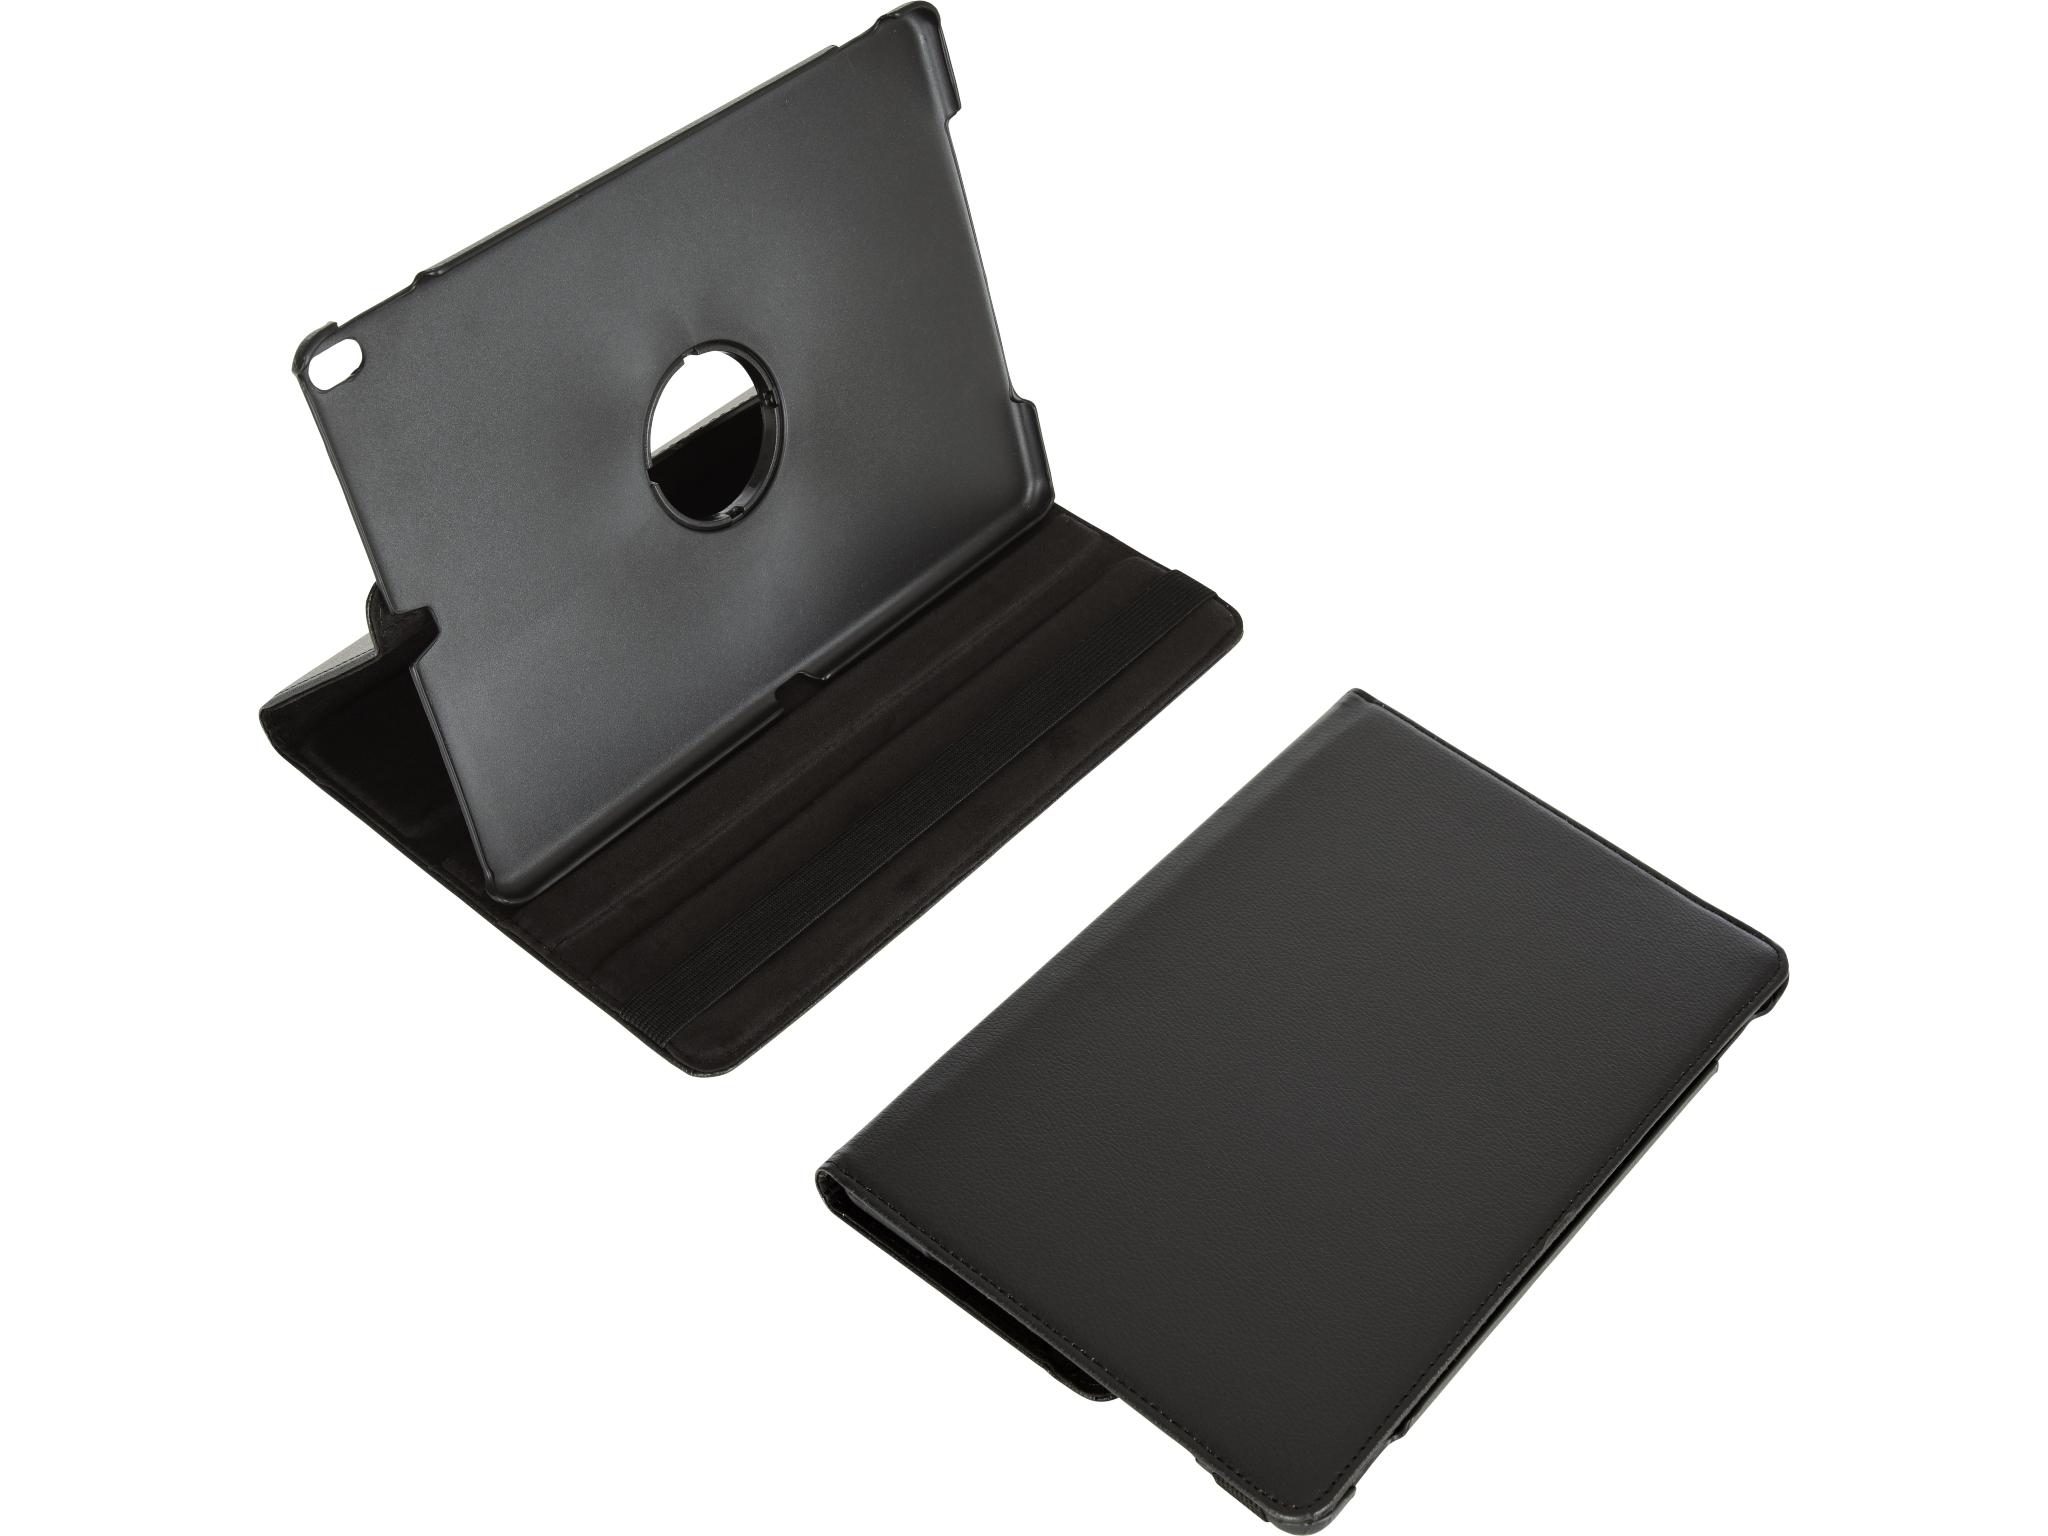 CoverStand iPadPro 10.5 Rotate